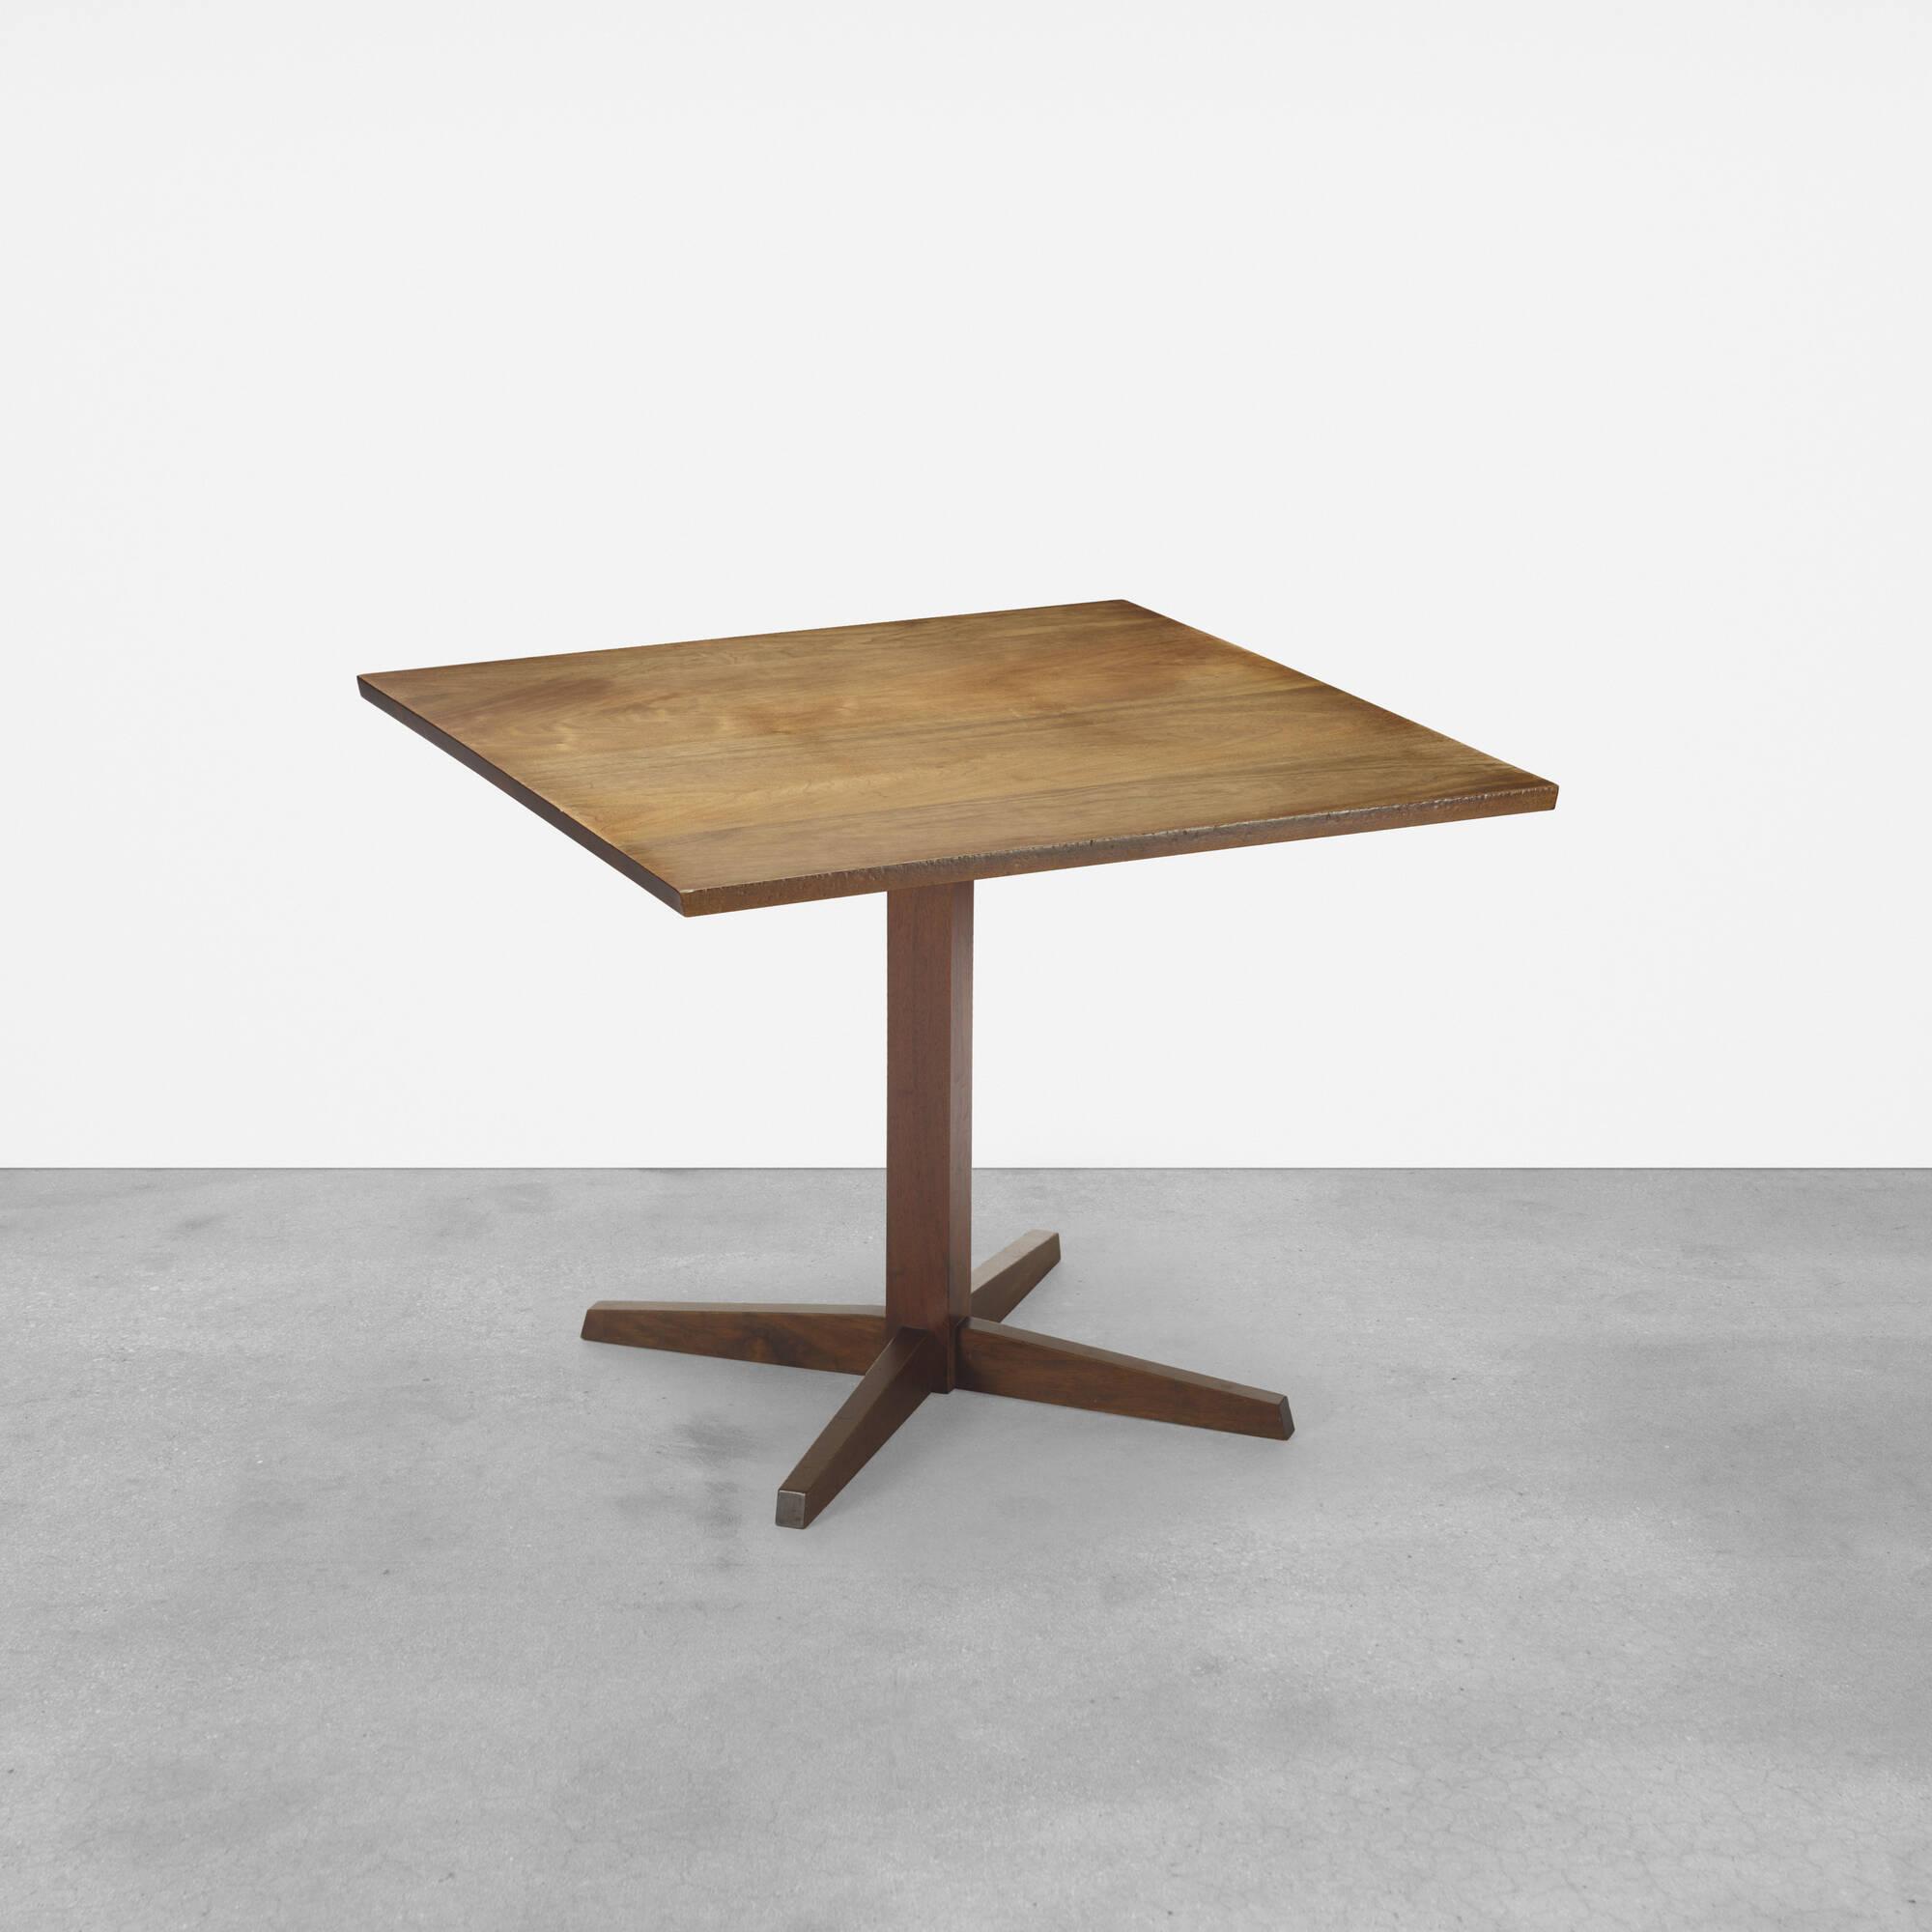 106: George Nakashima / Pedestal table (1 of 2)